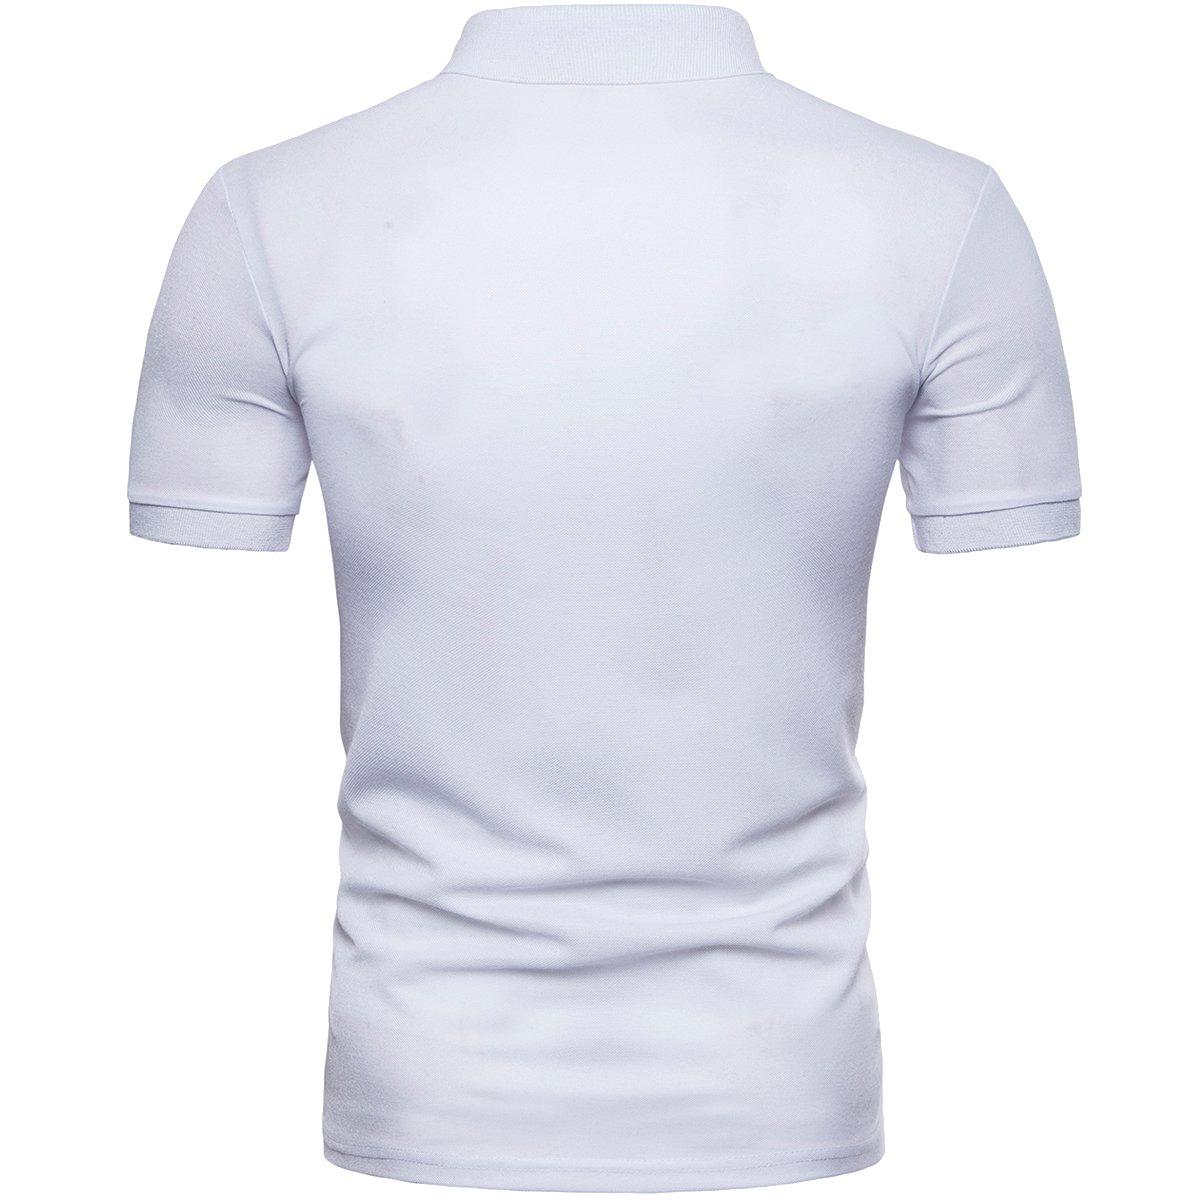 Cottory Mens Slim Fit Tee Digital Printed Polo Shirt Outwear